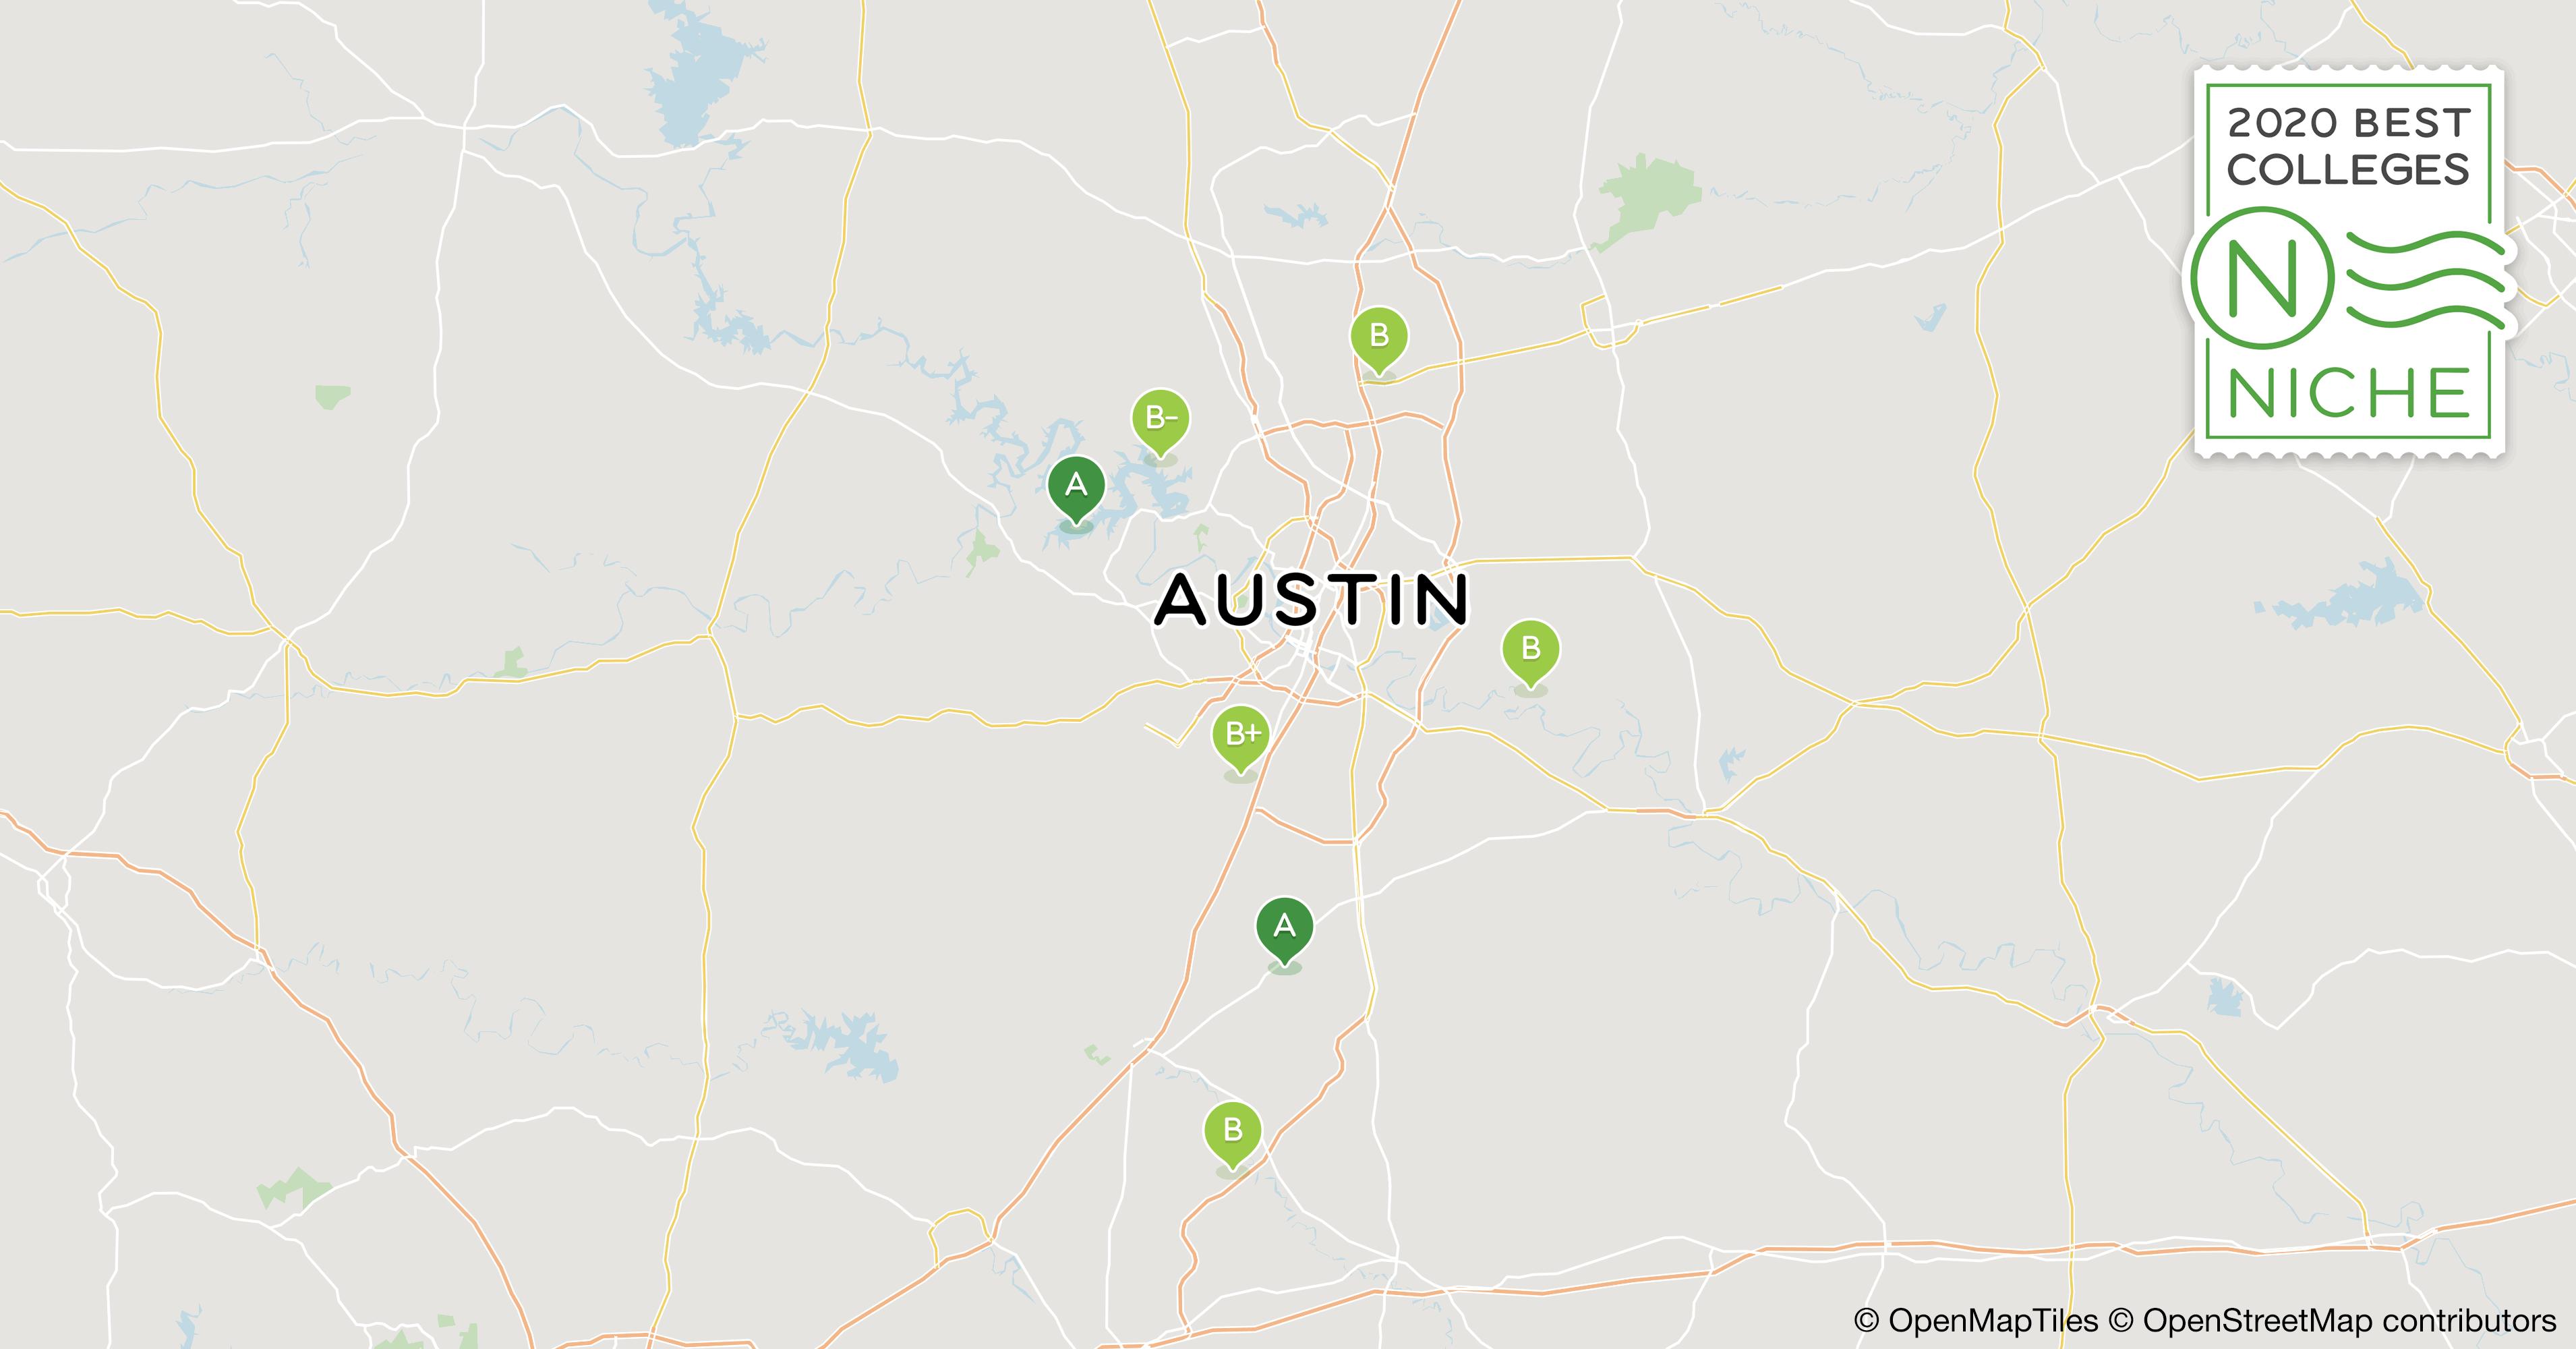 Best Places To Work In Austin 2020 2020 Best Colleges in Austin Area   Niche